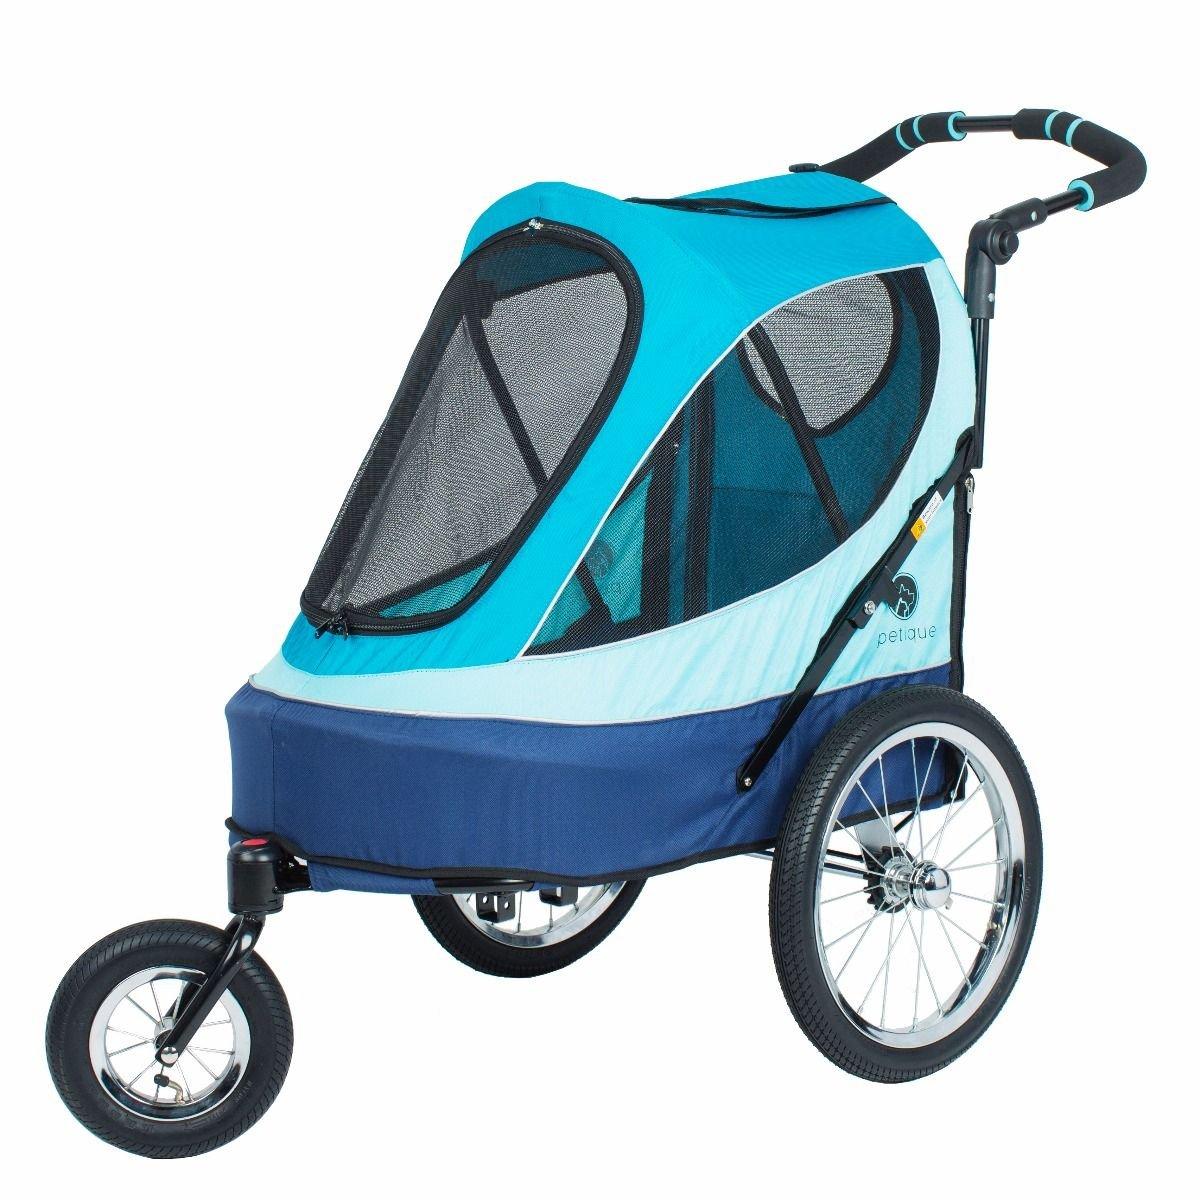 PETIQUE All Terrain Jogger-Sailboat Pet Stroller, Sailboat, One Size by PETIQUE